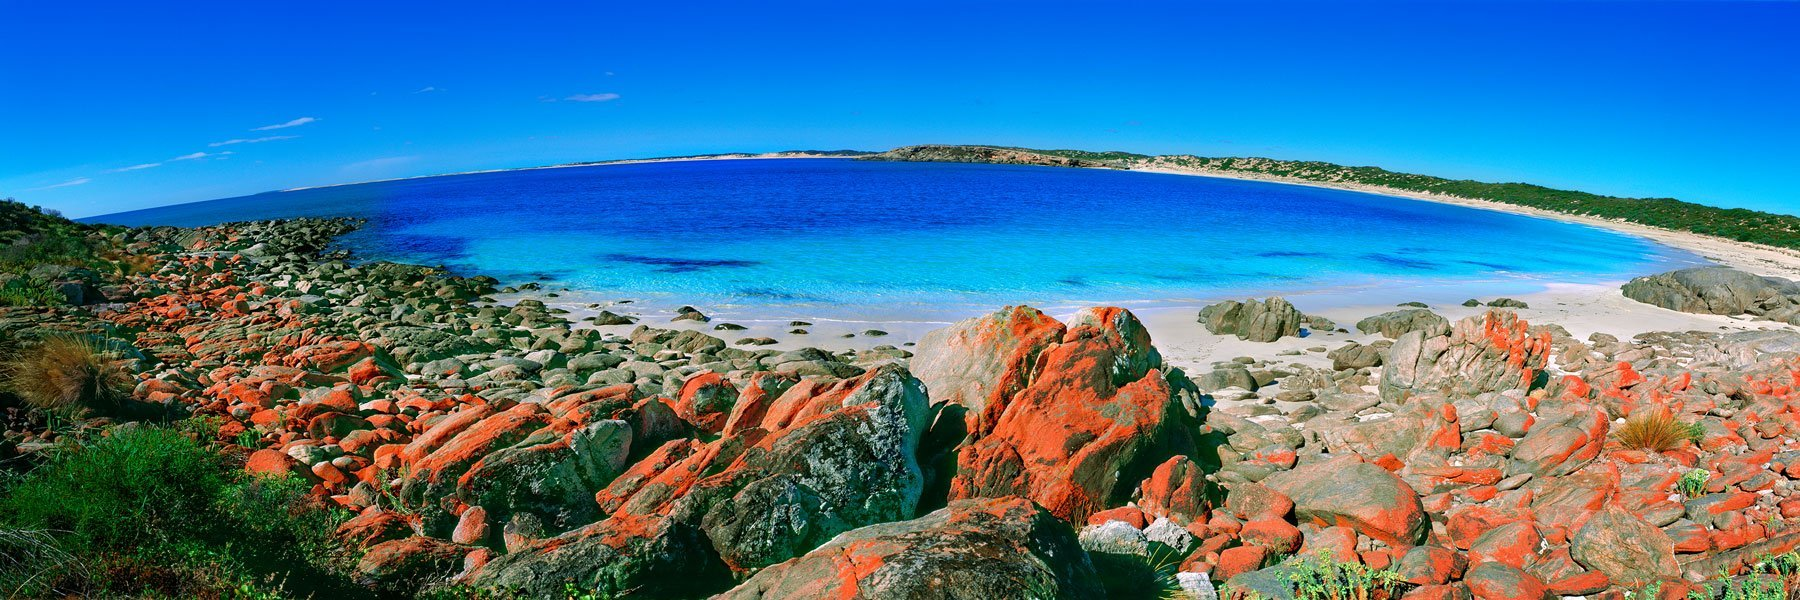 Dolphin Beach, Innes National Park, Yorke Peninsula, SA, Australia.